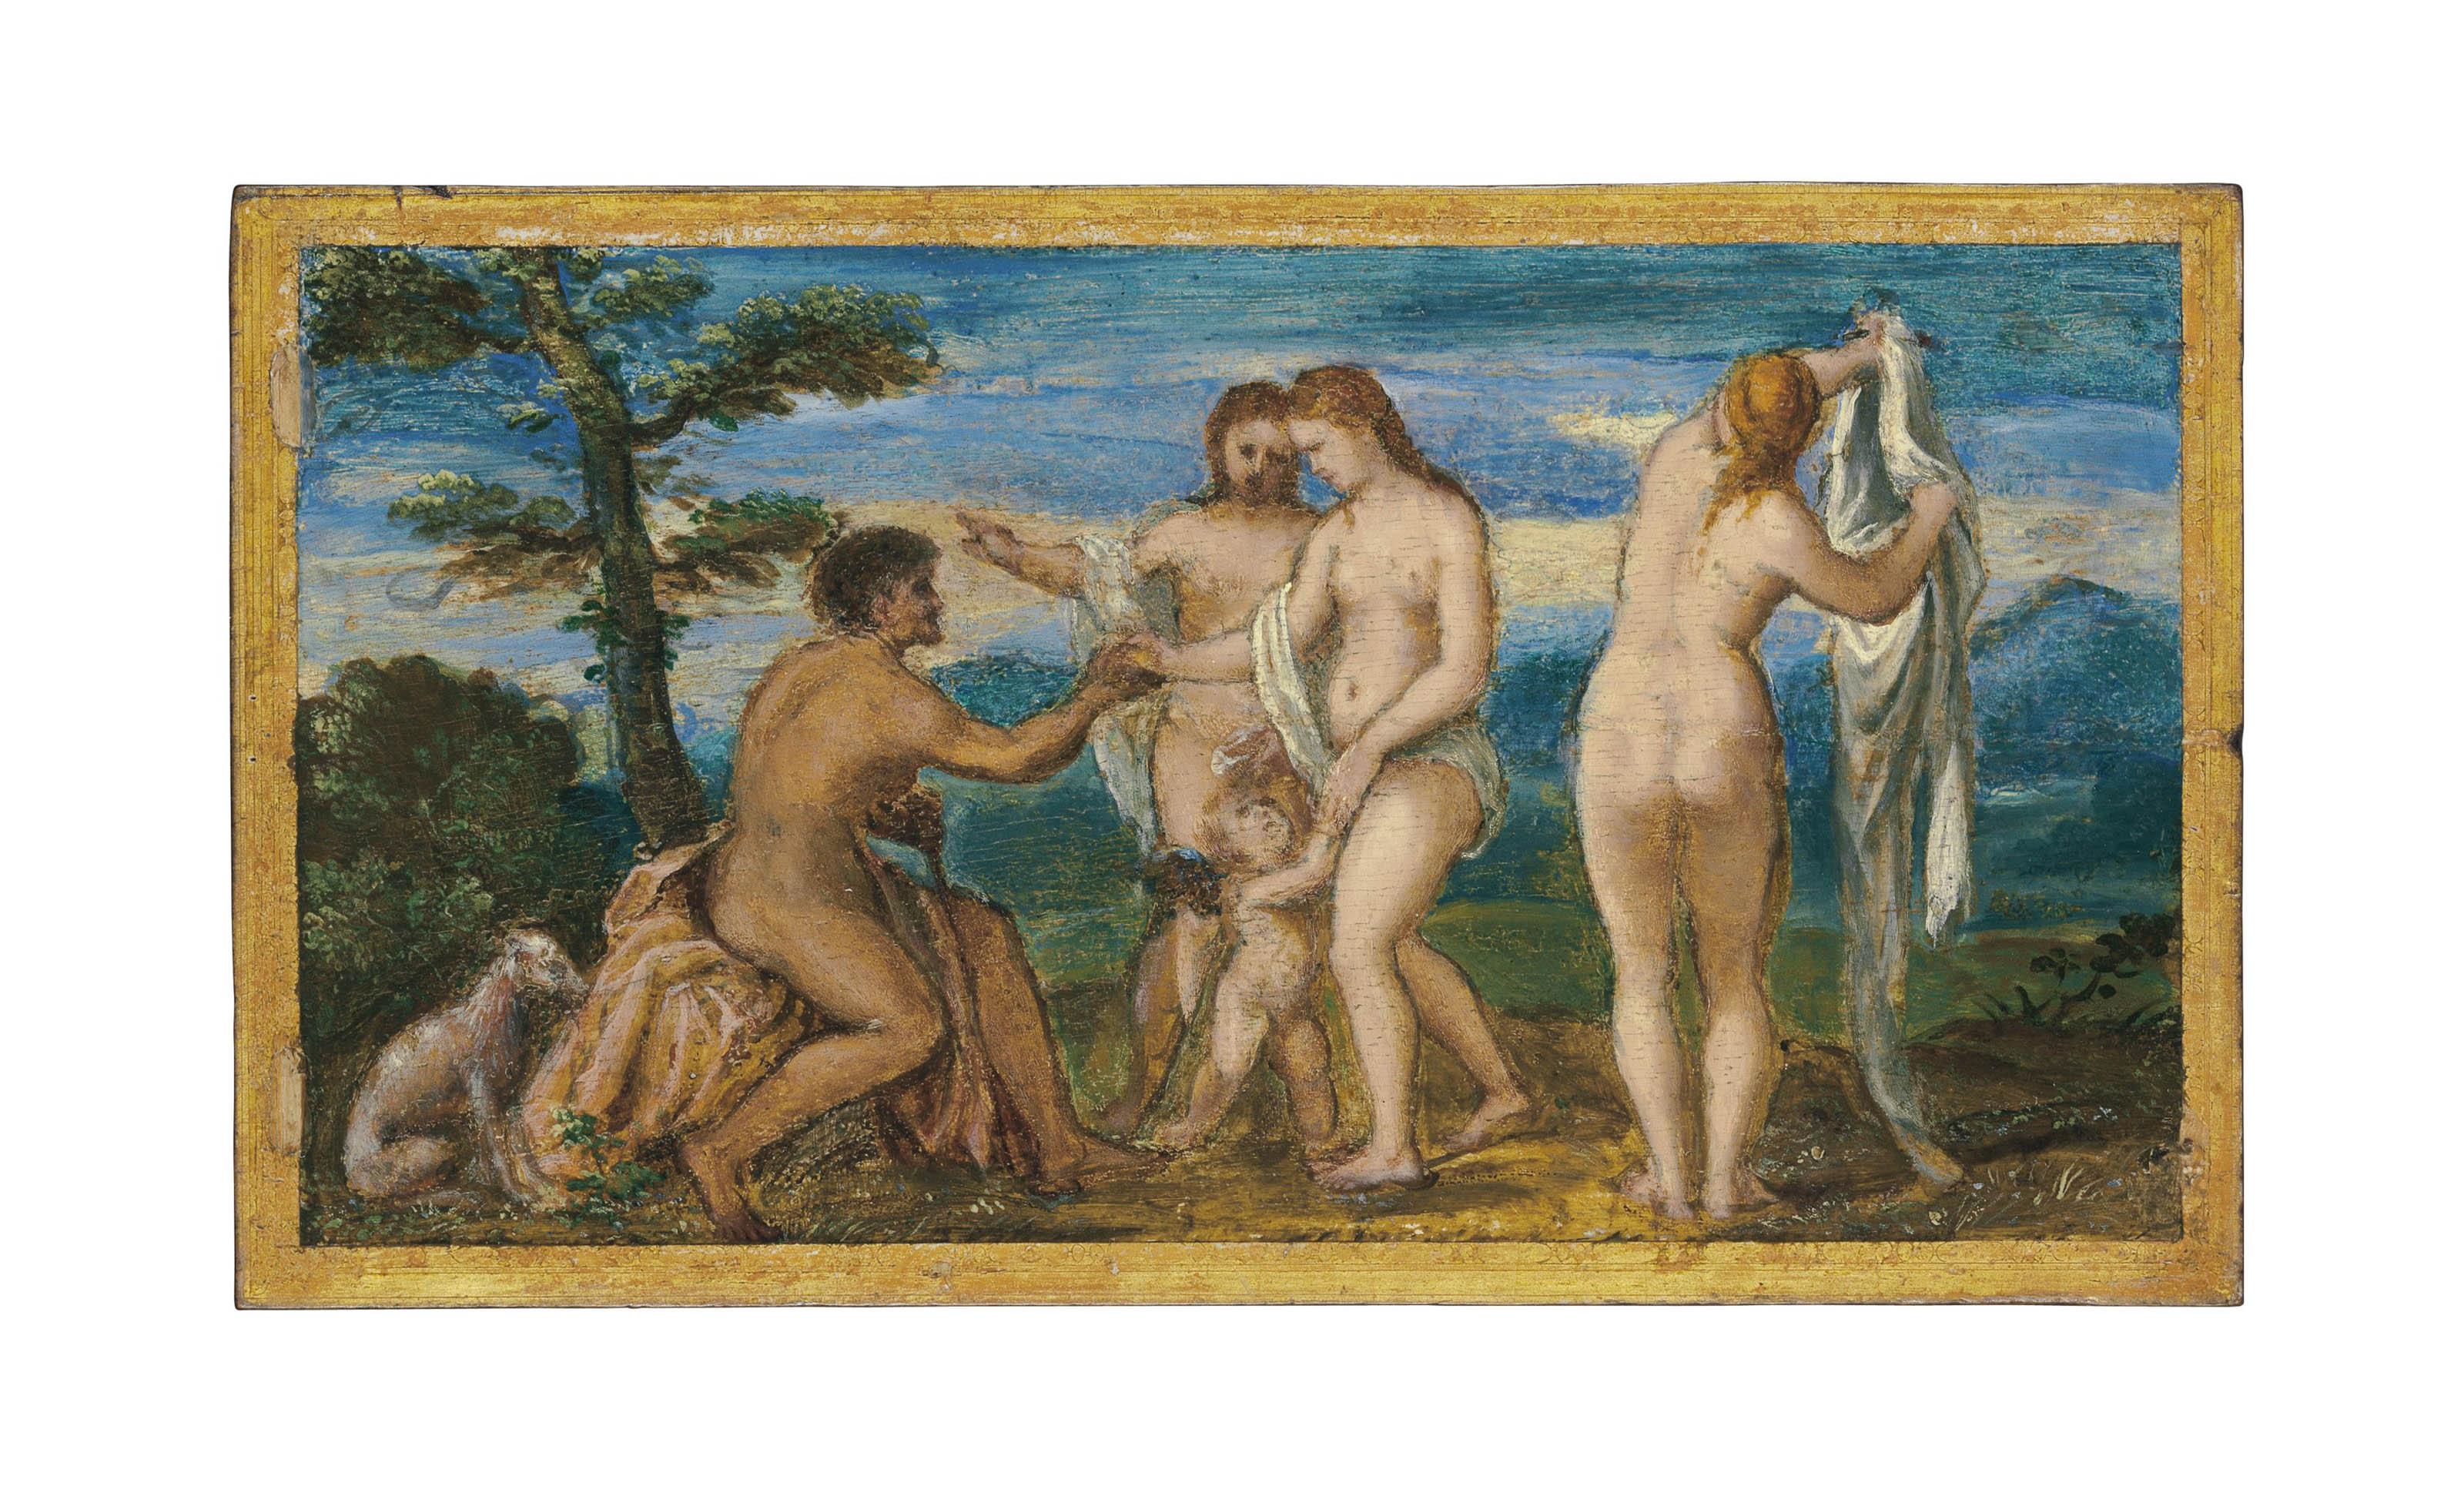 Andrea Schiavone (Zara? circa 1510-1563 Venice)